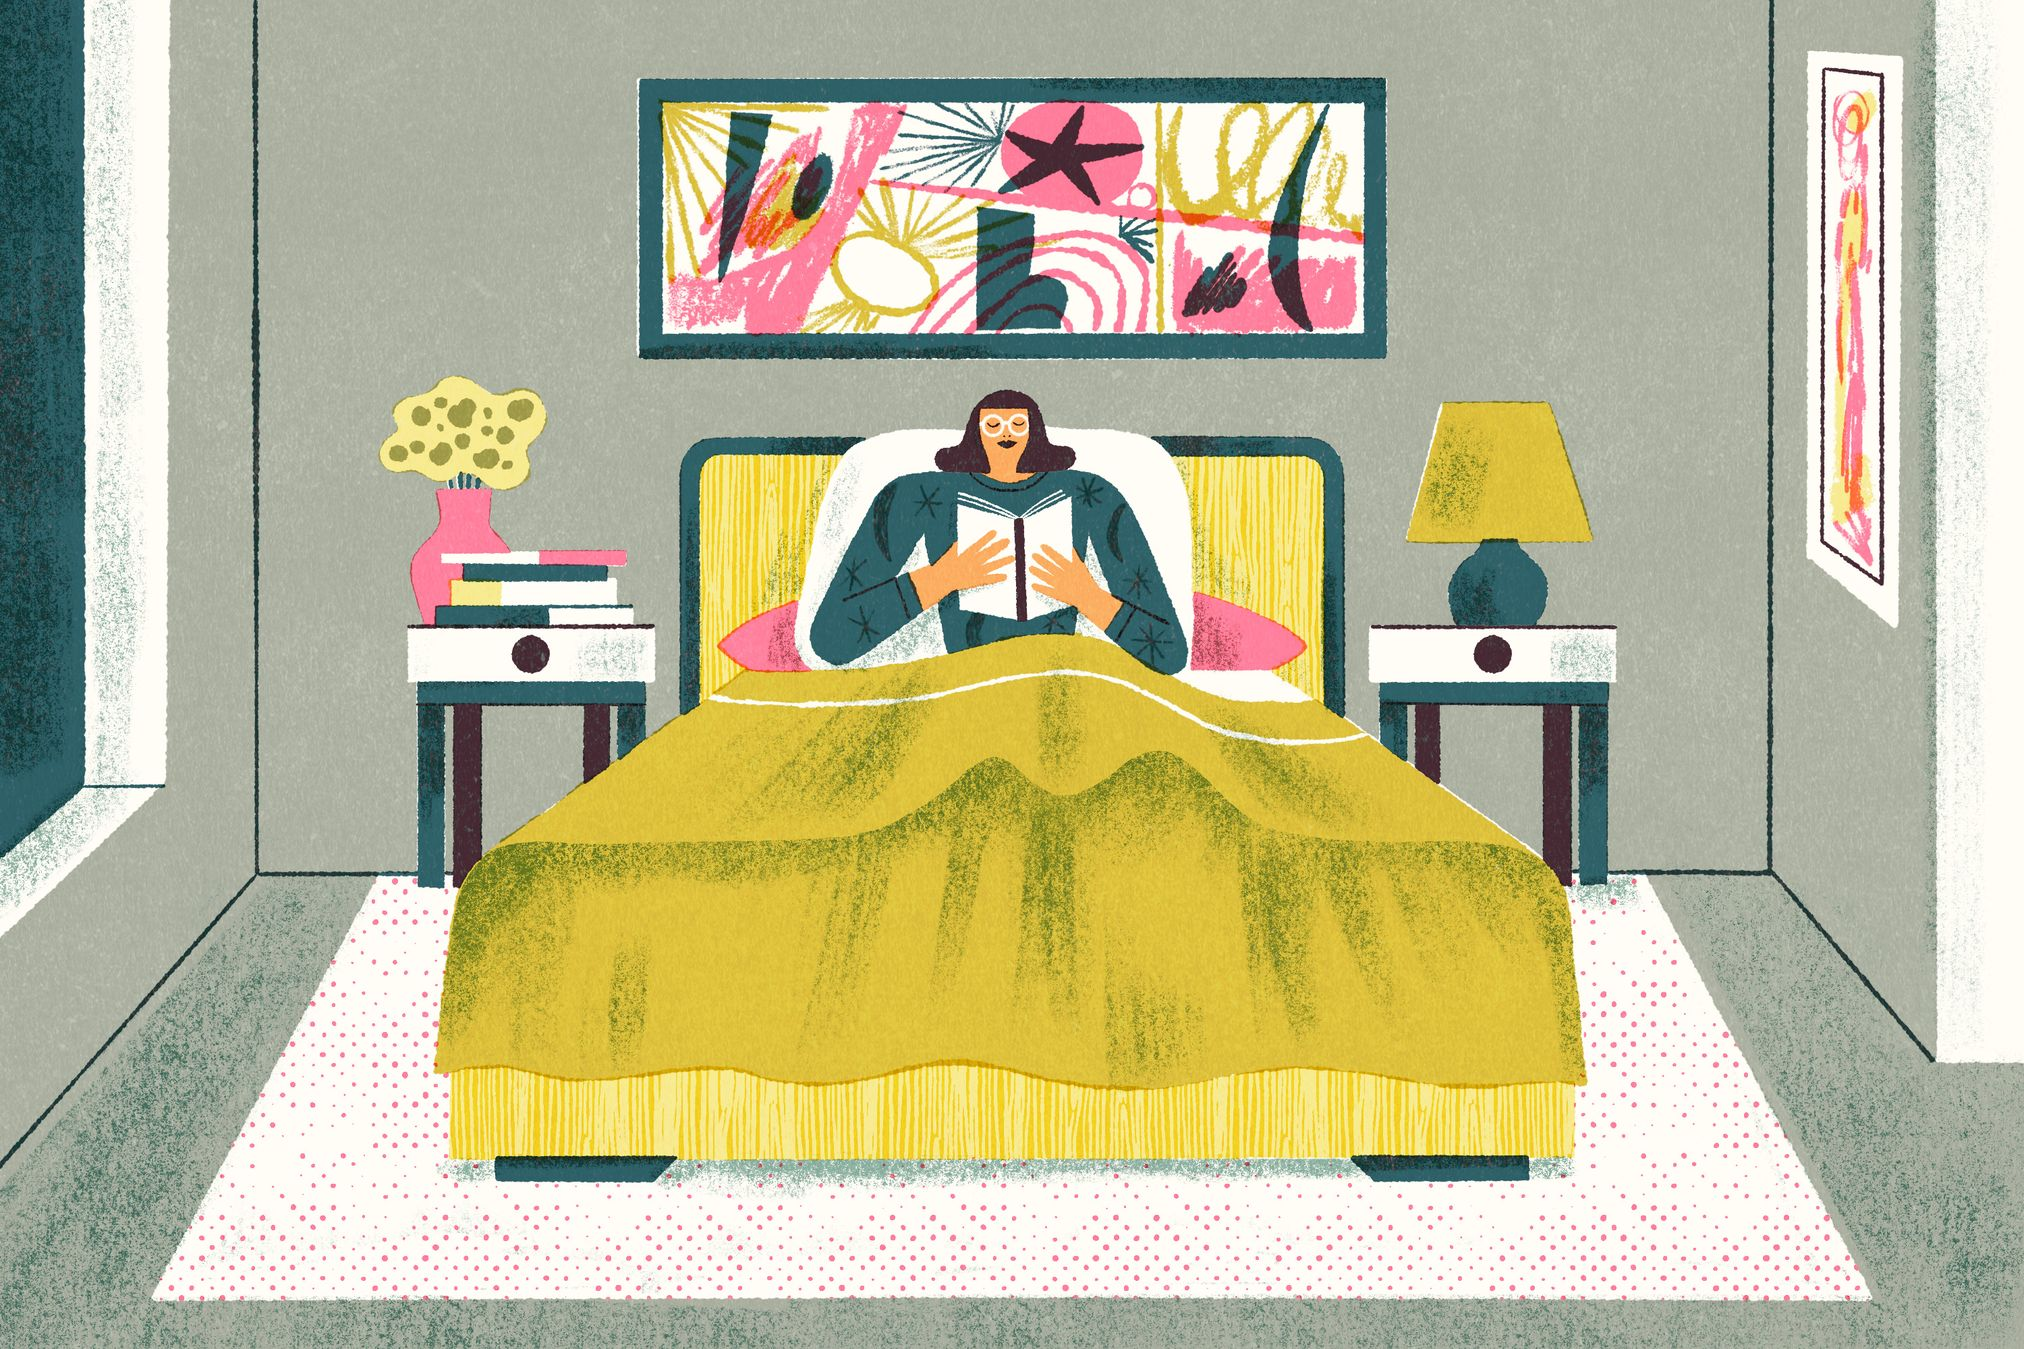 garance-illustration-Malota-Stop-Bringing-Devices-to-the-Bedroom_web